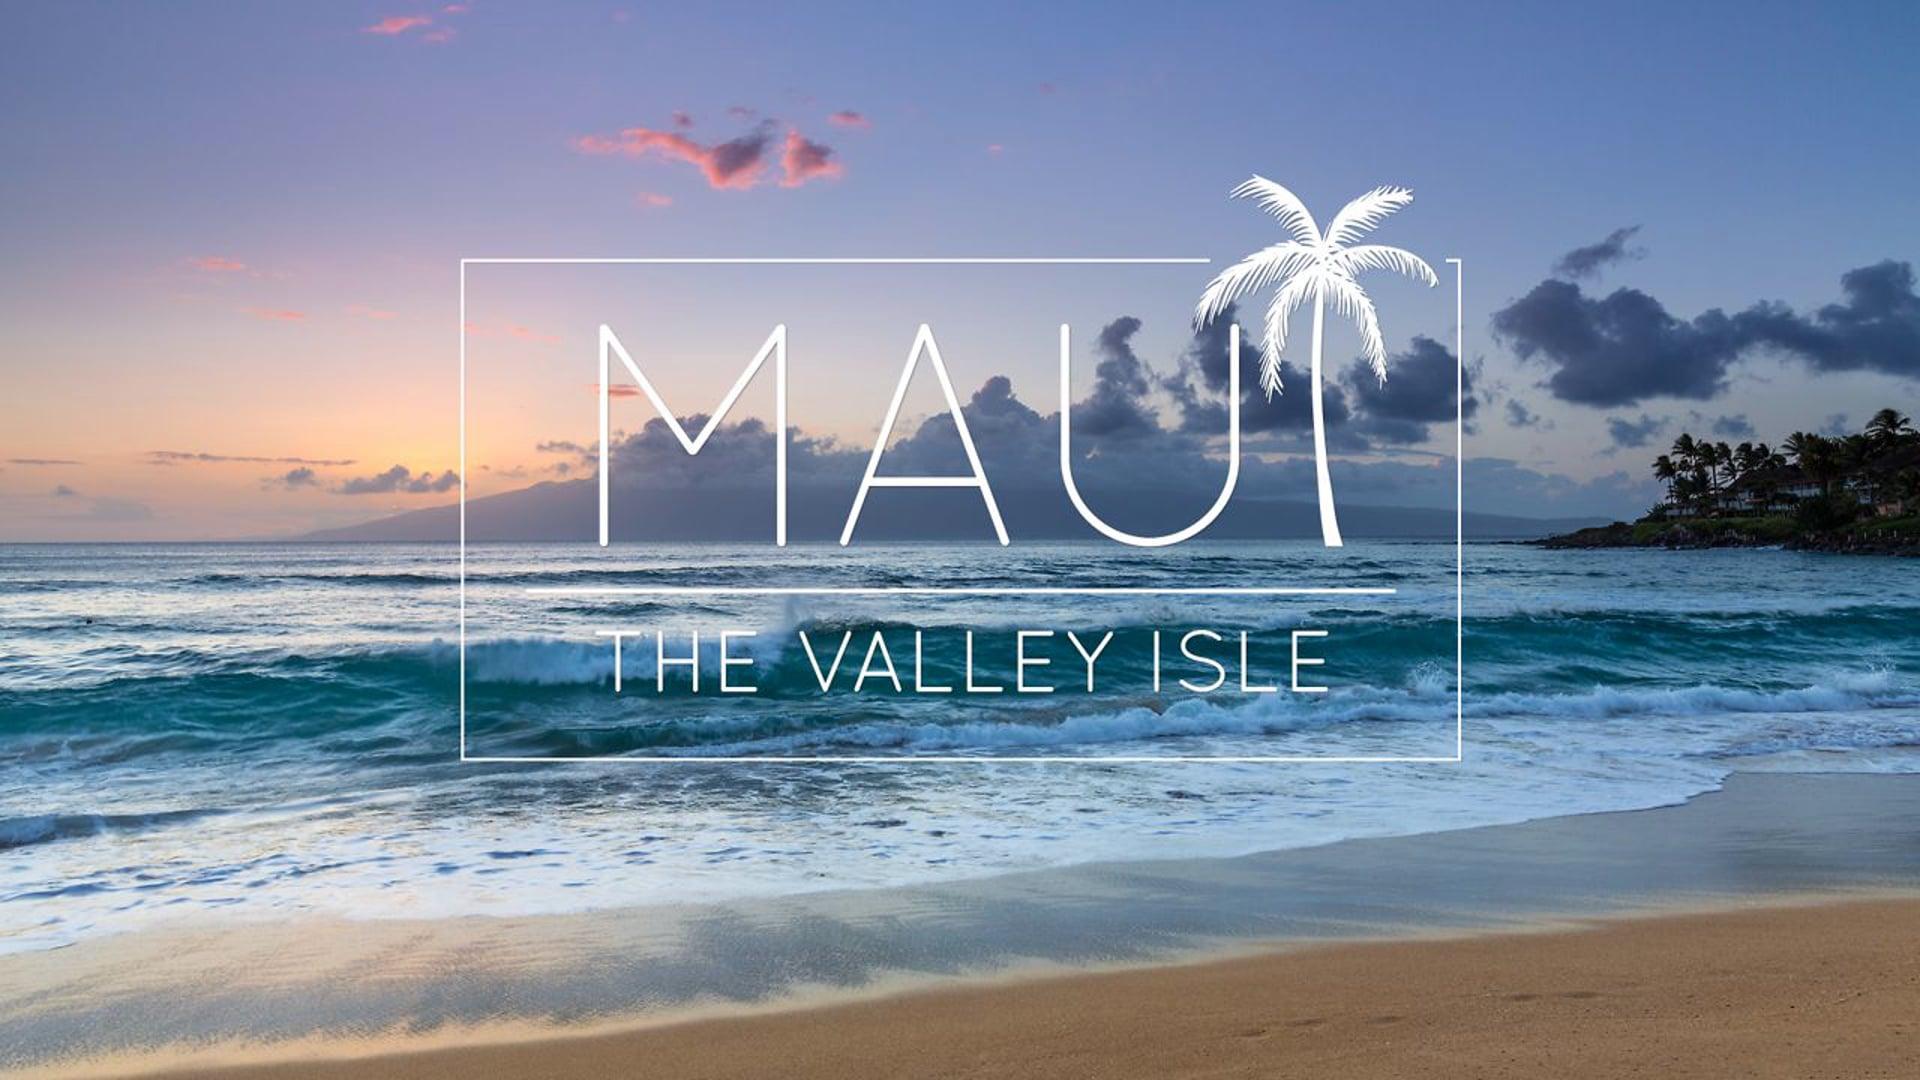 Maui: The Valley Isle